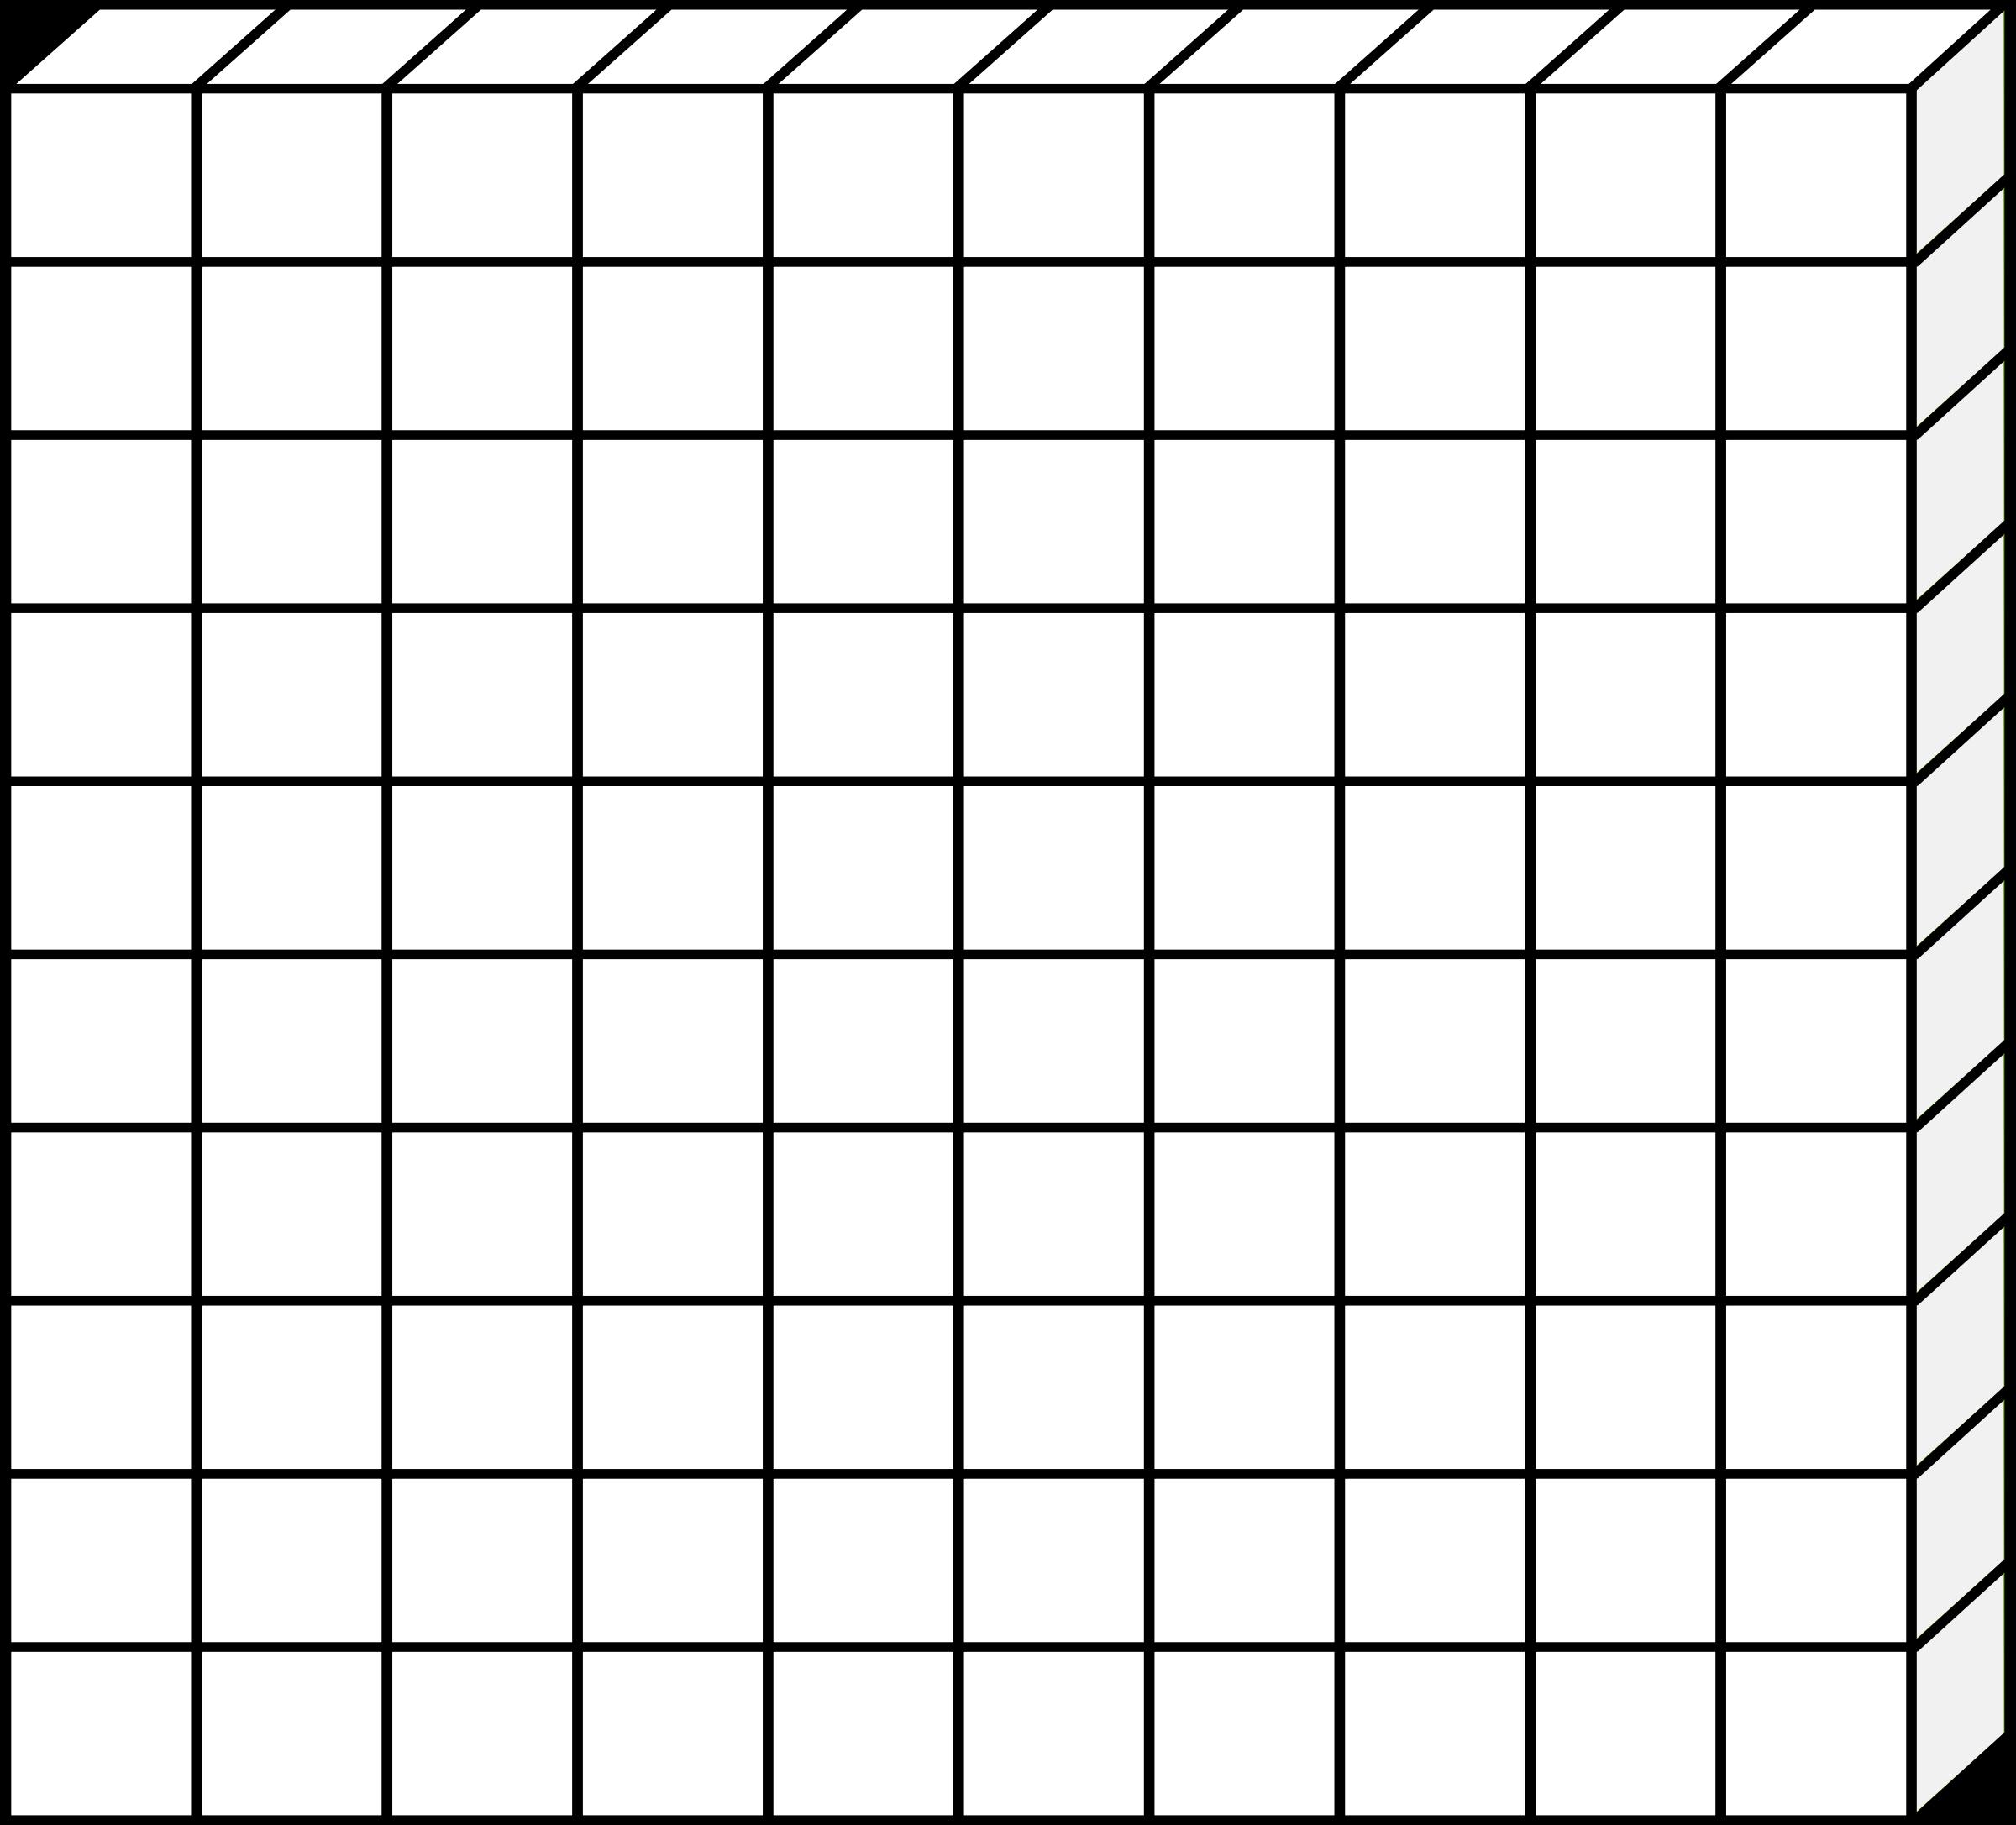 Worksheet. Decimal Of 100. Mikyu Free Worksheet.